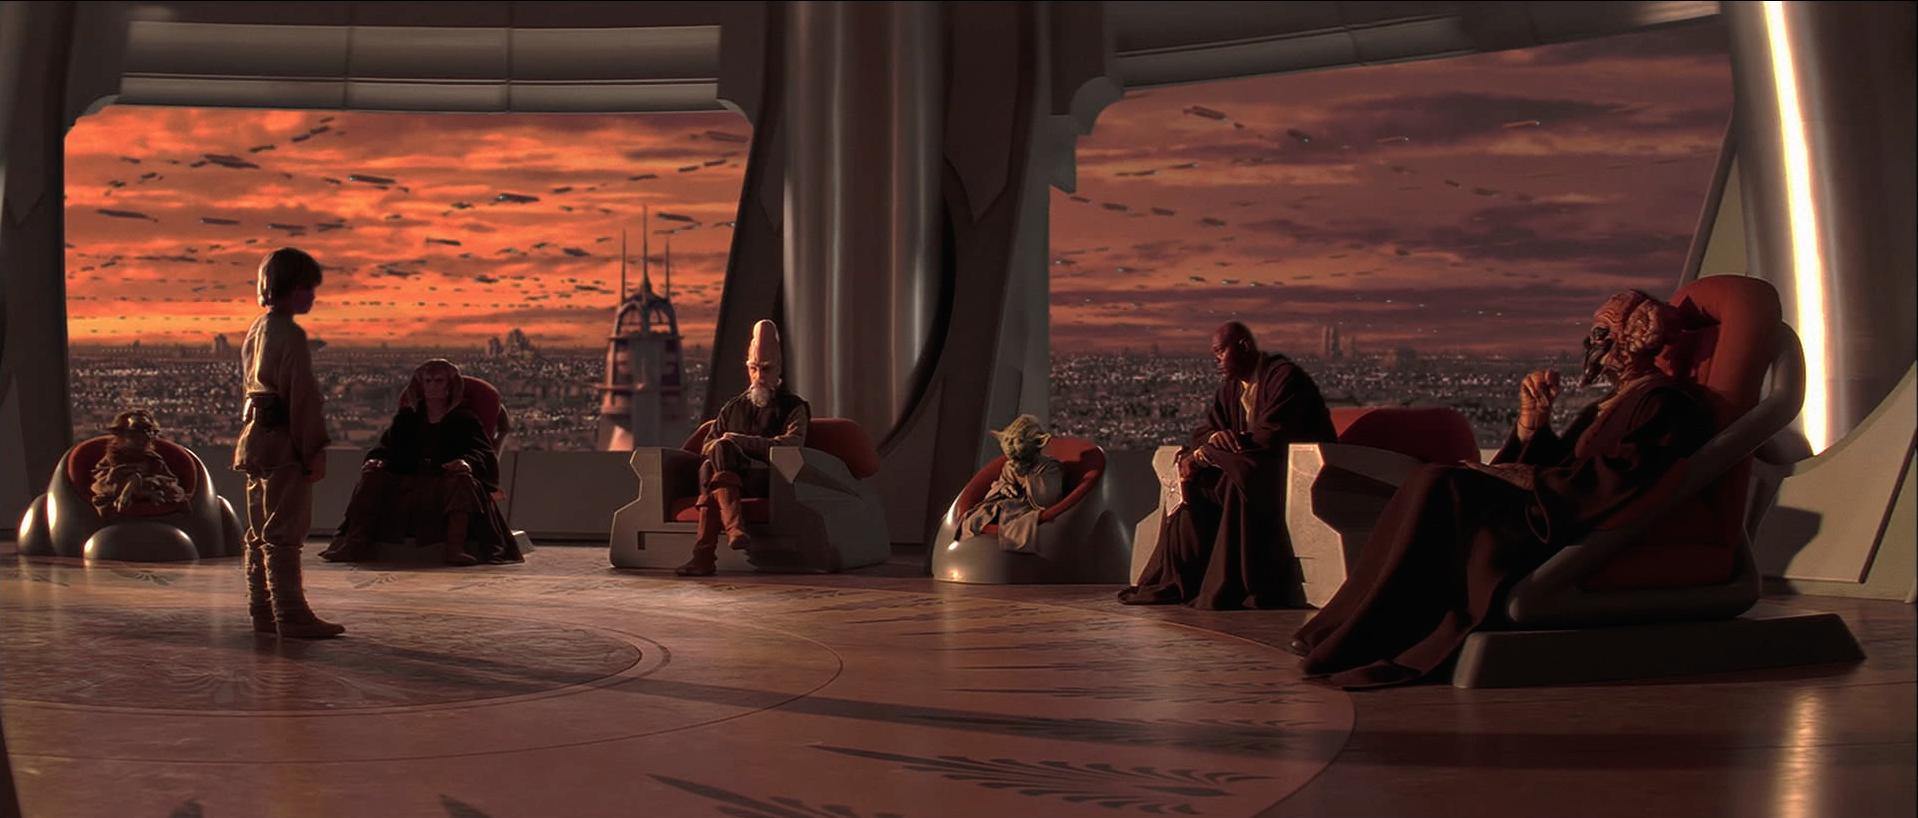 "An Honest Look at ""Star Wars: Episode I - The Phantom Menace"""